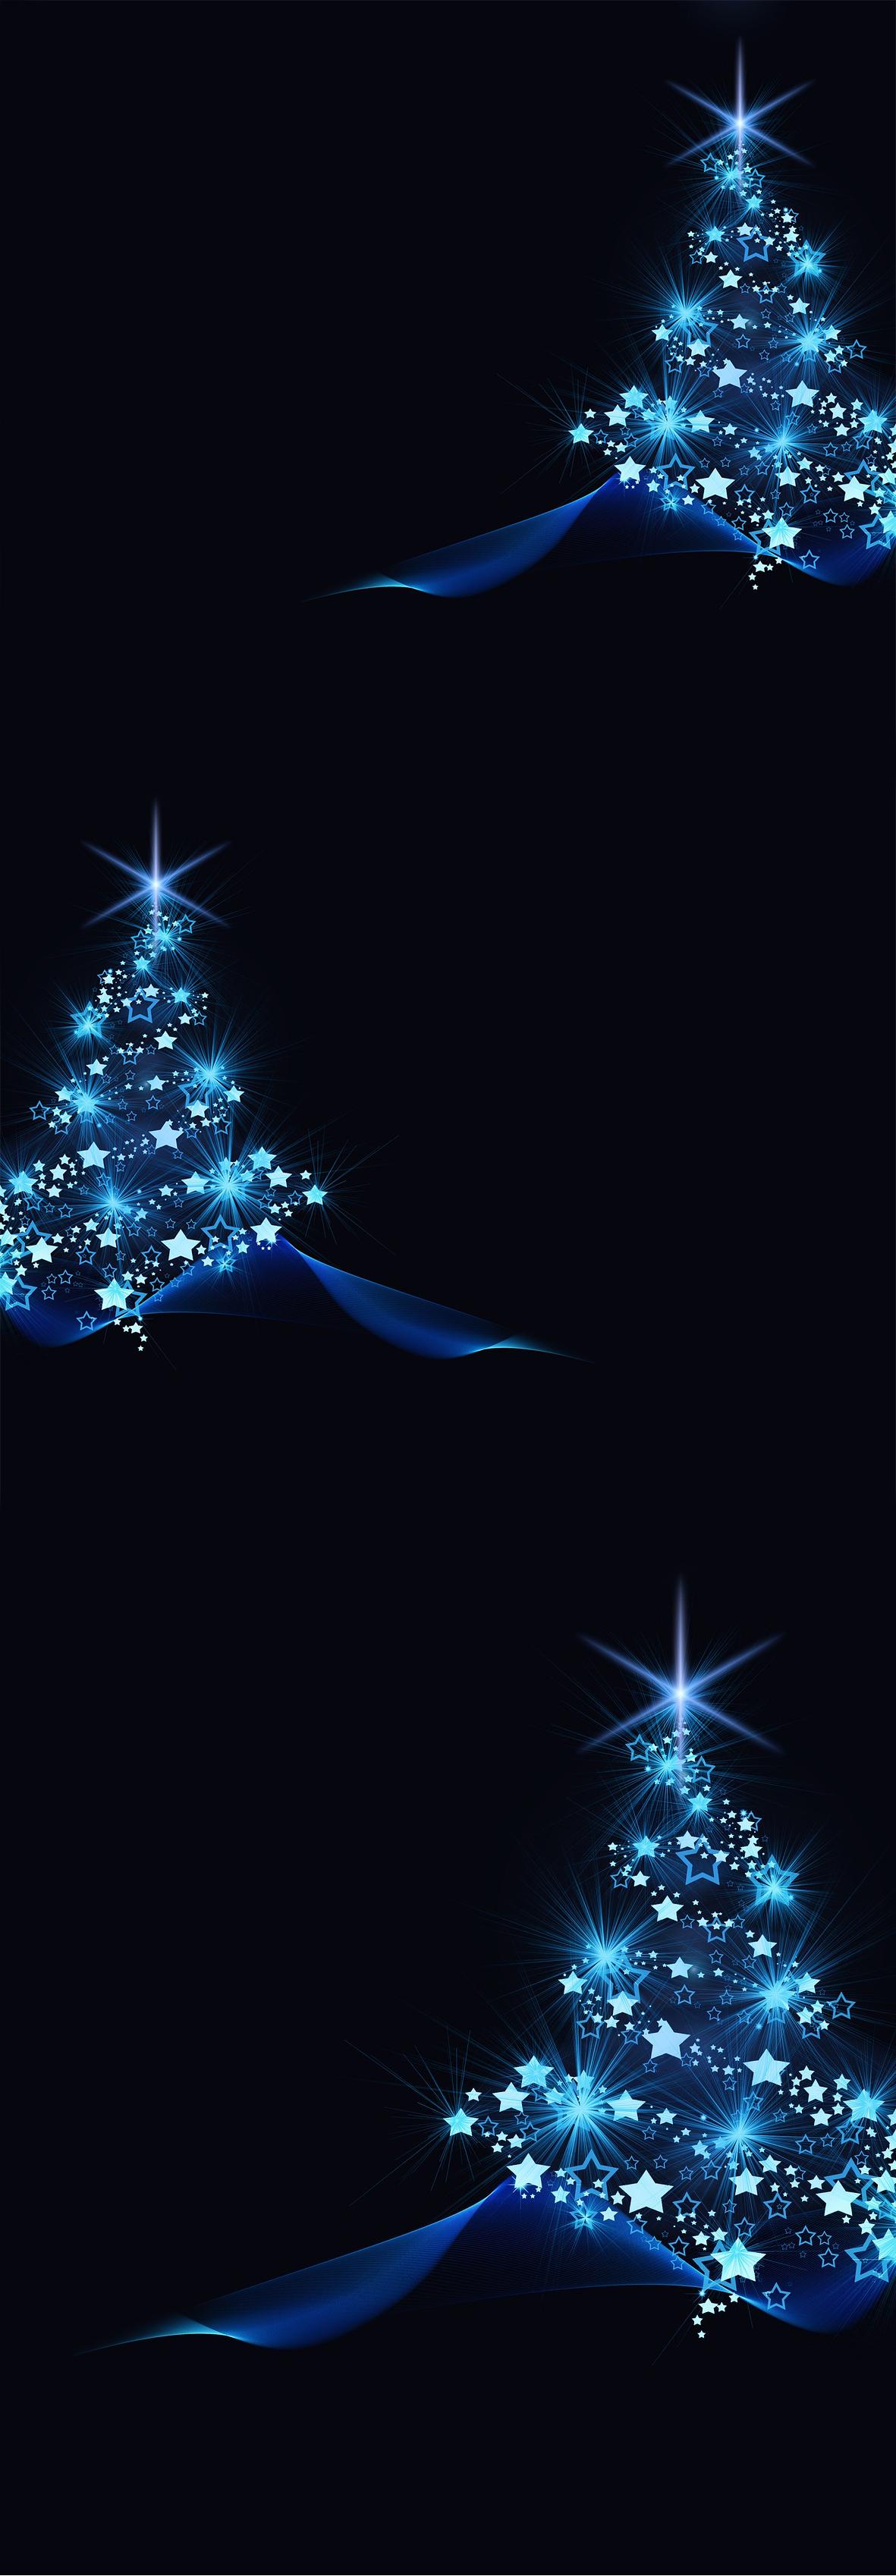 Natalestoria4